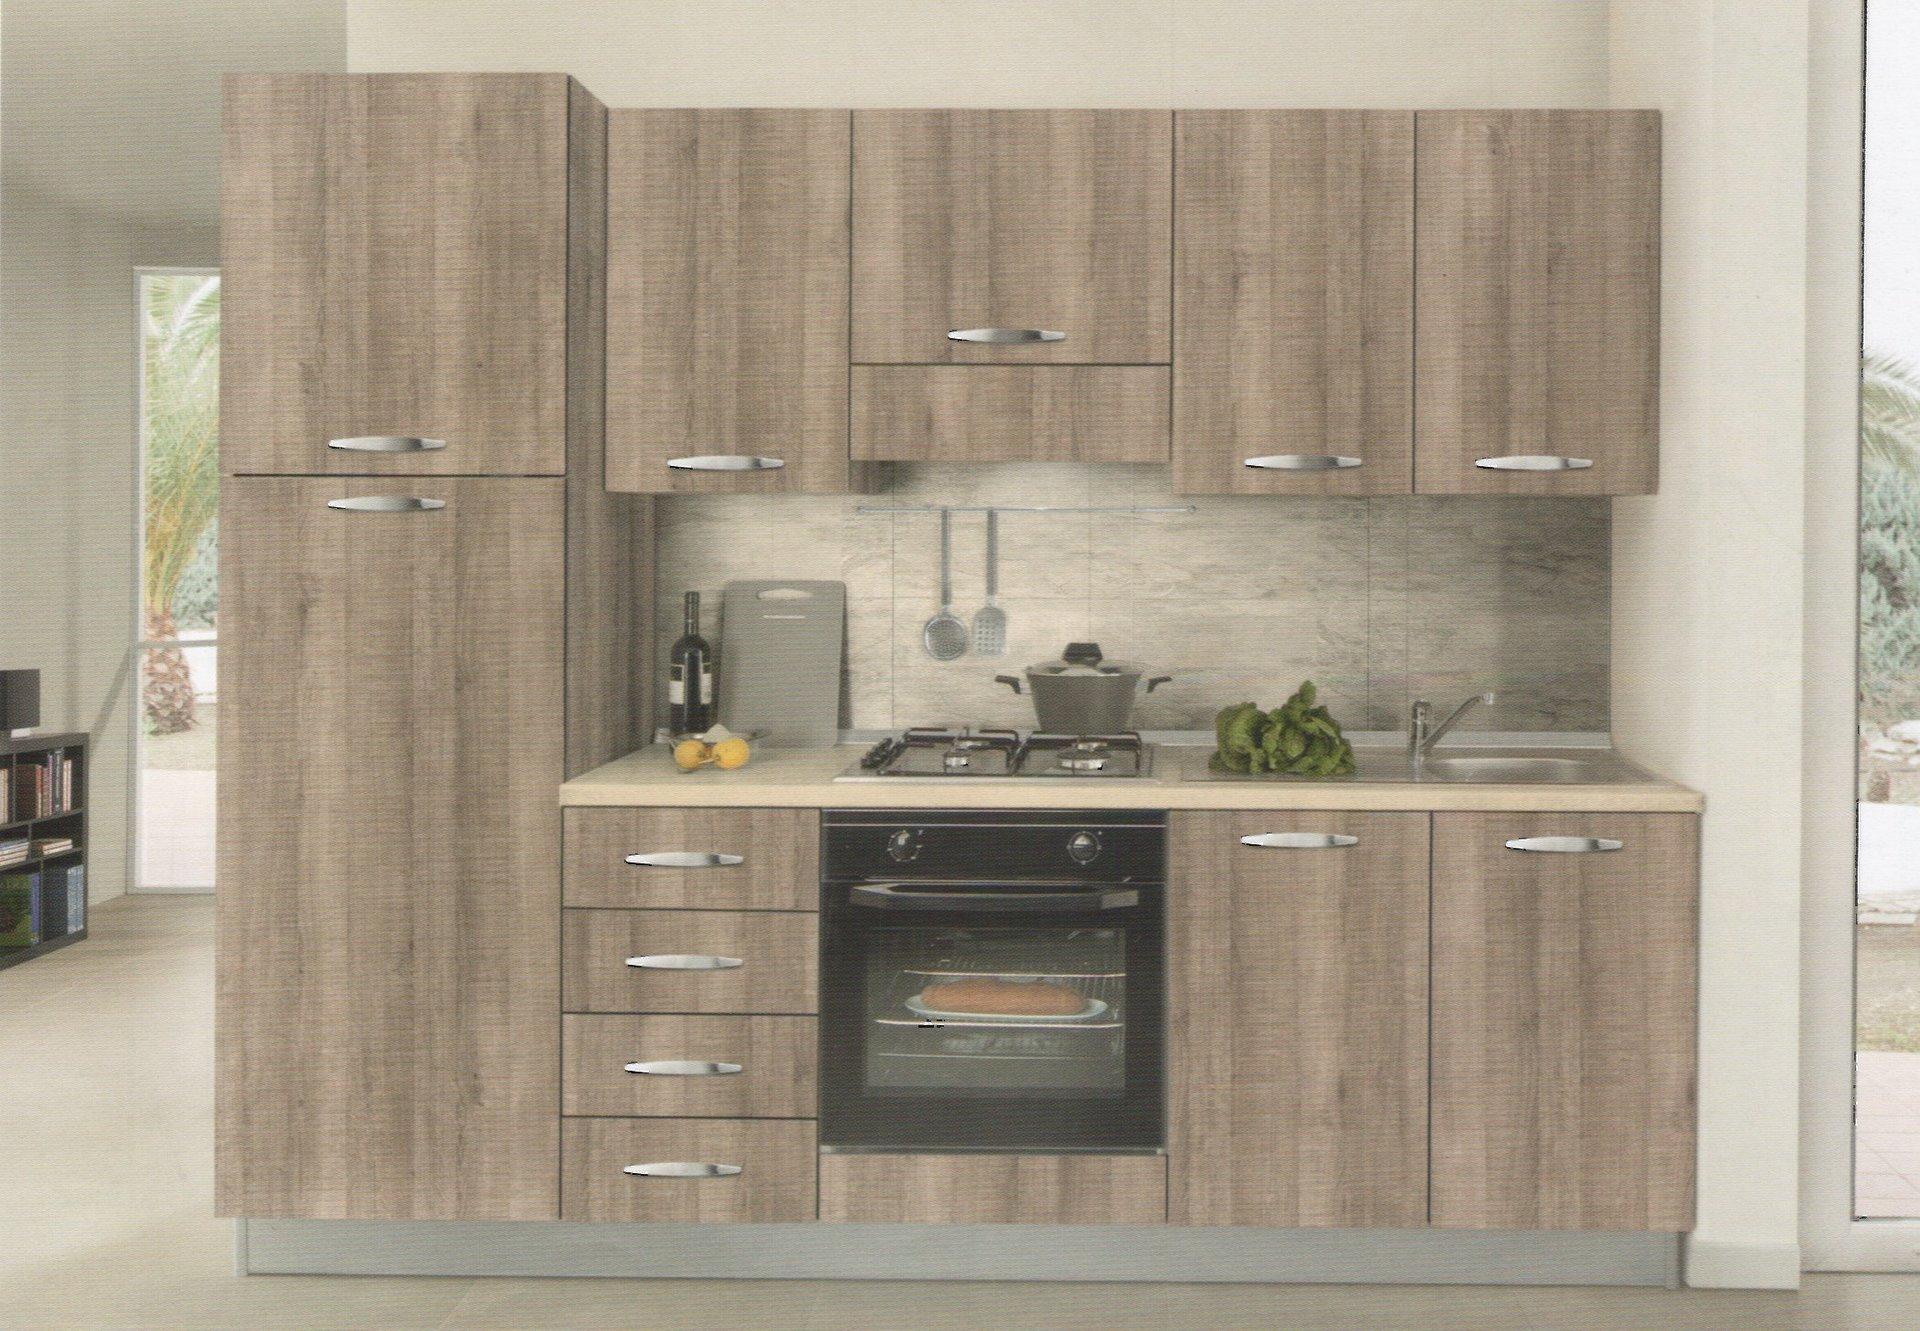 Cucine moderne cucine berloni avezzano savina mobili for Costruisci la tua cucina